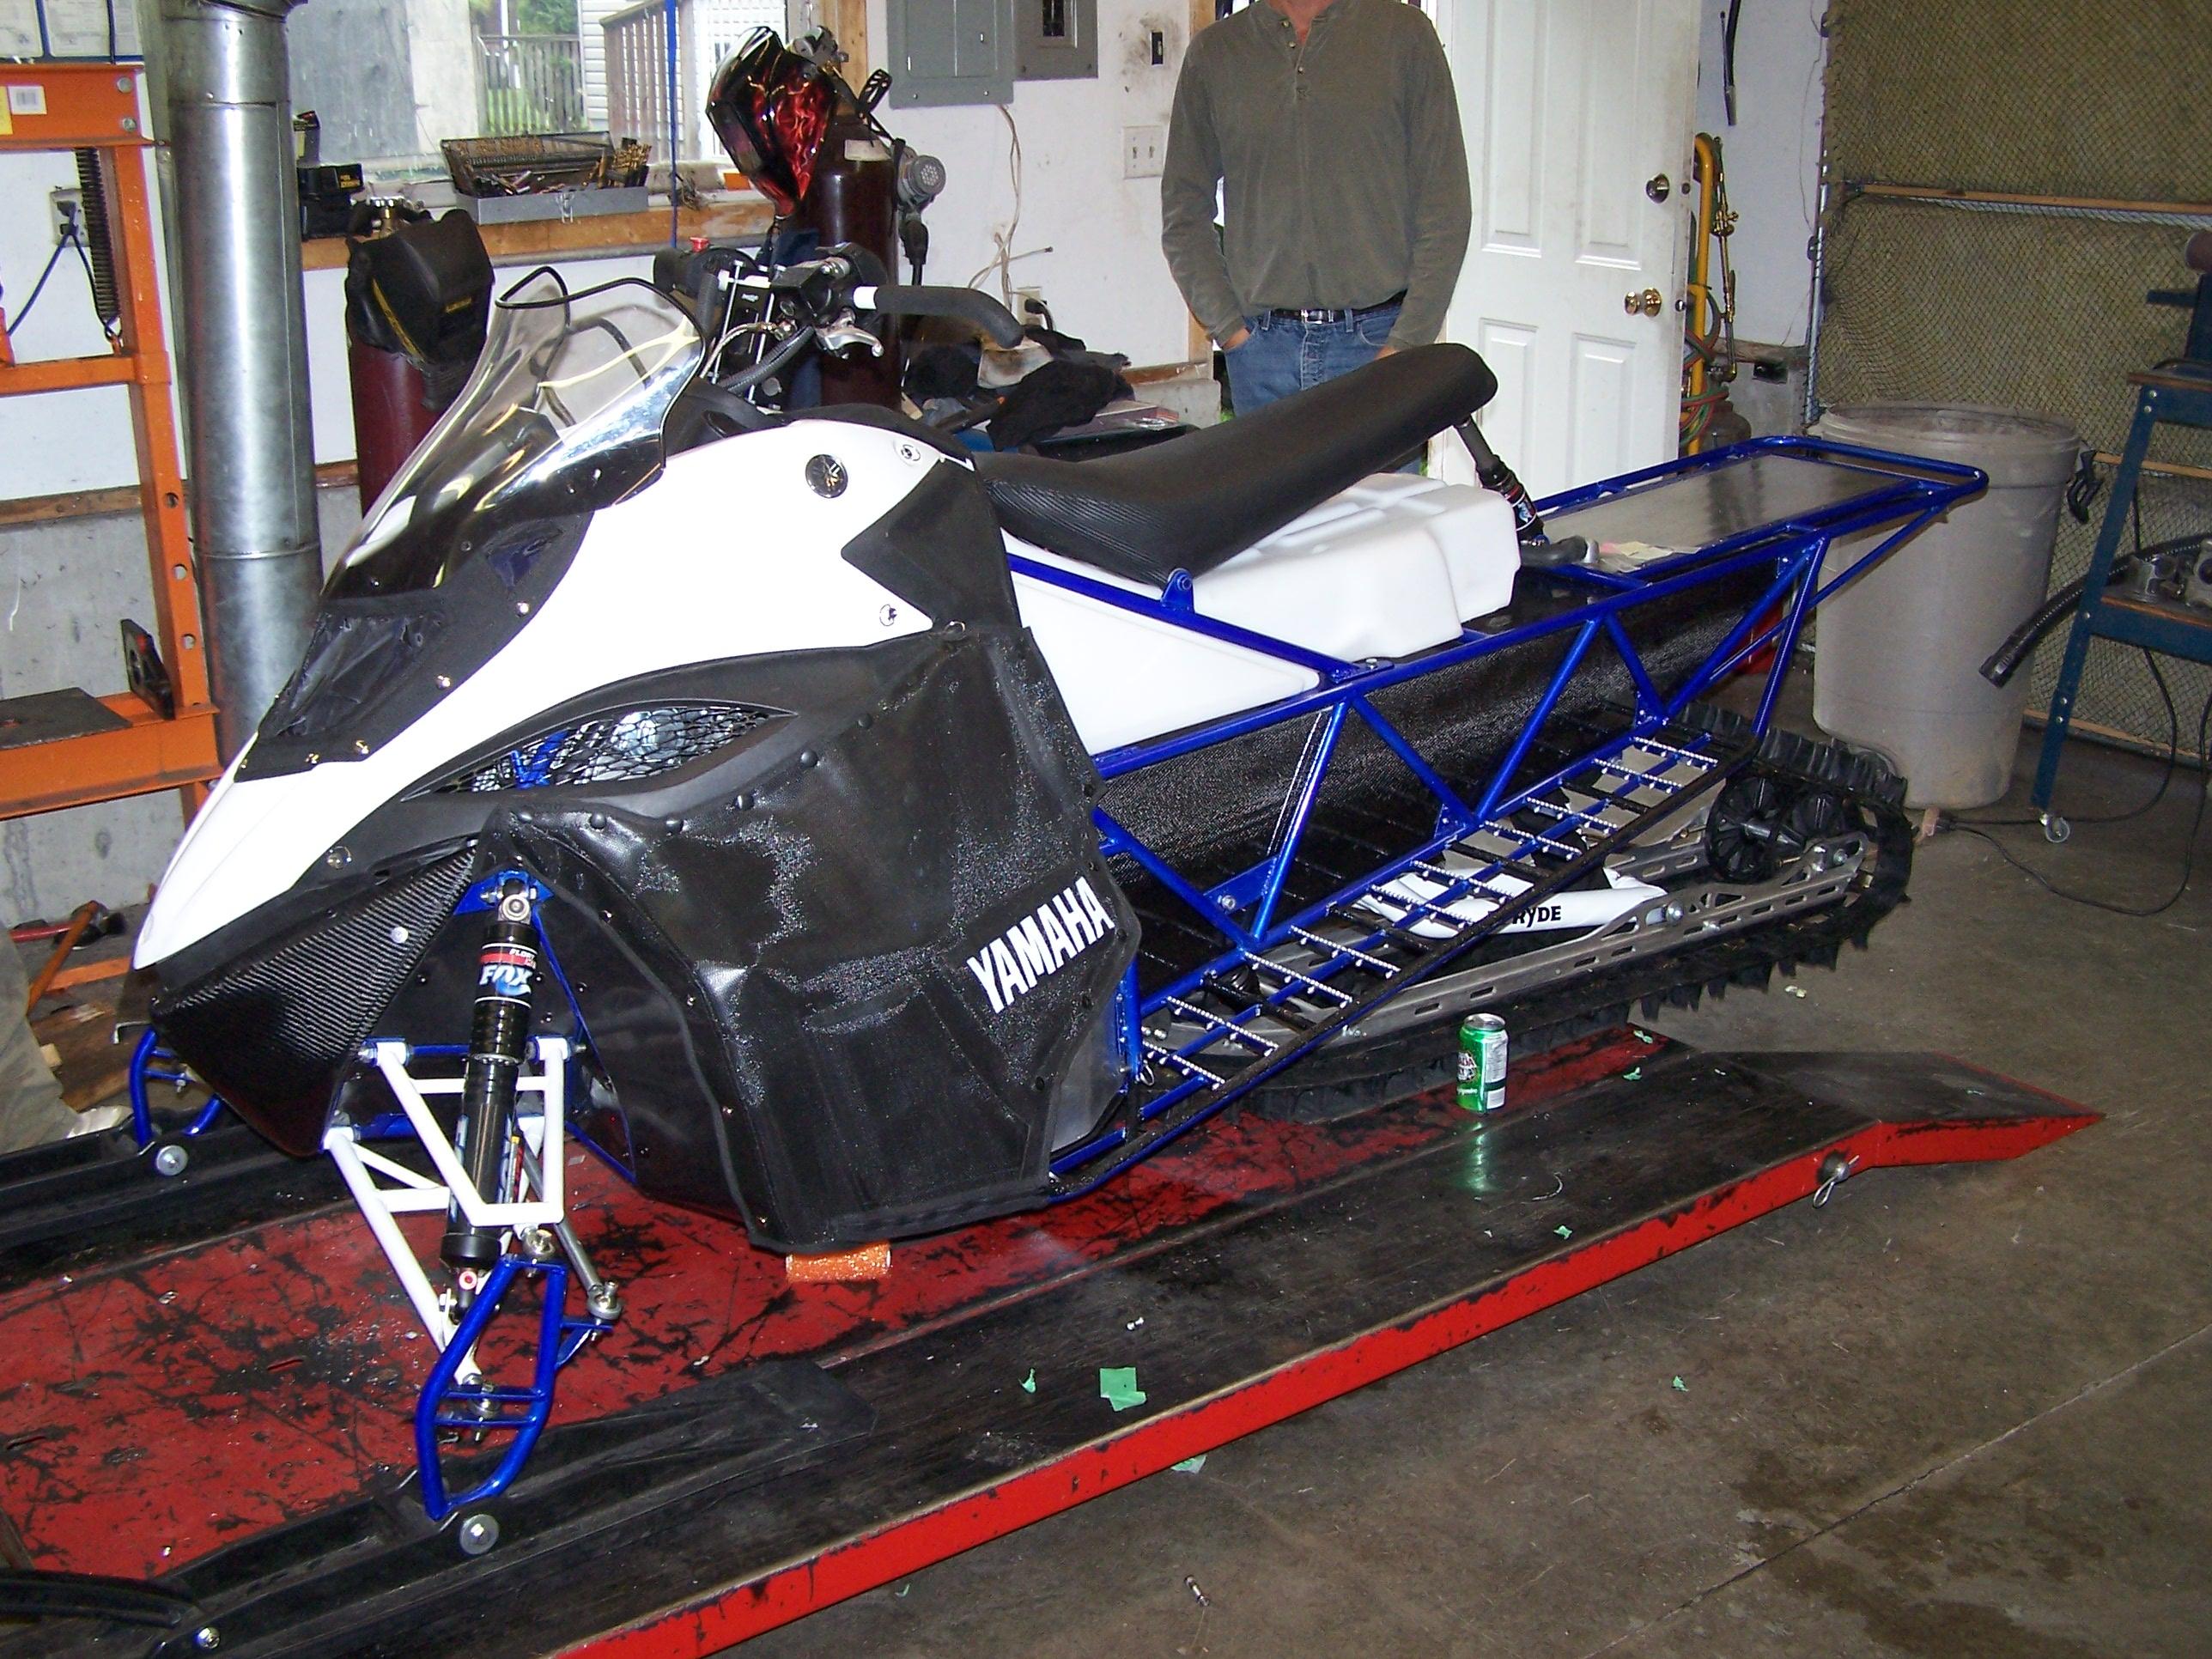 xt-350-blue-sled-024